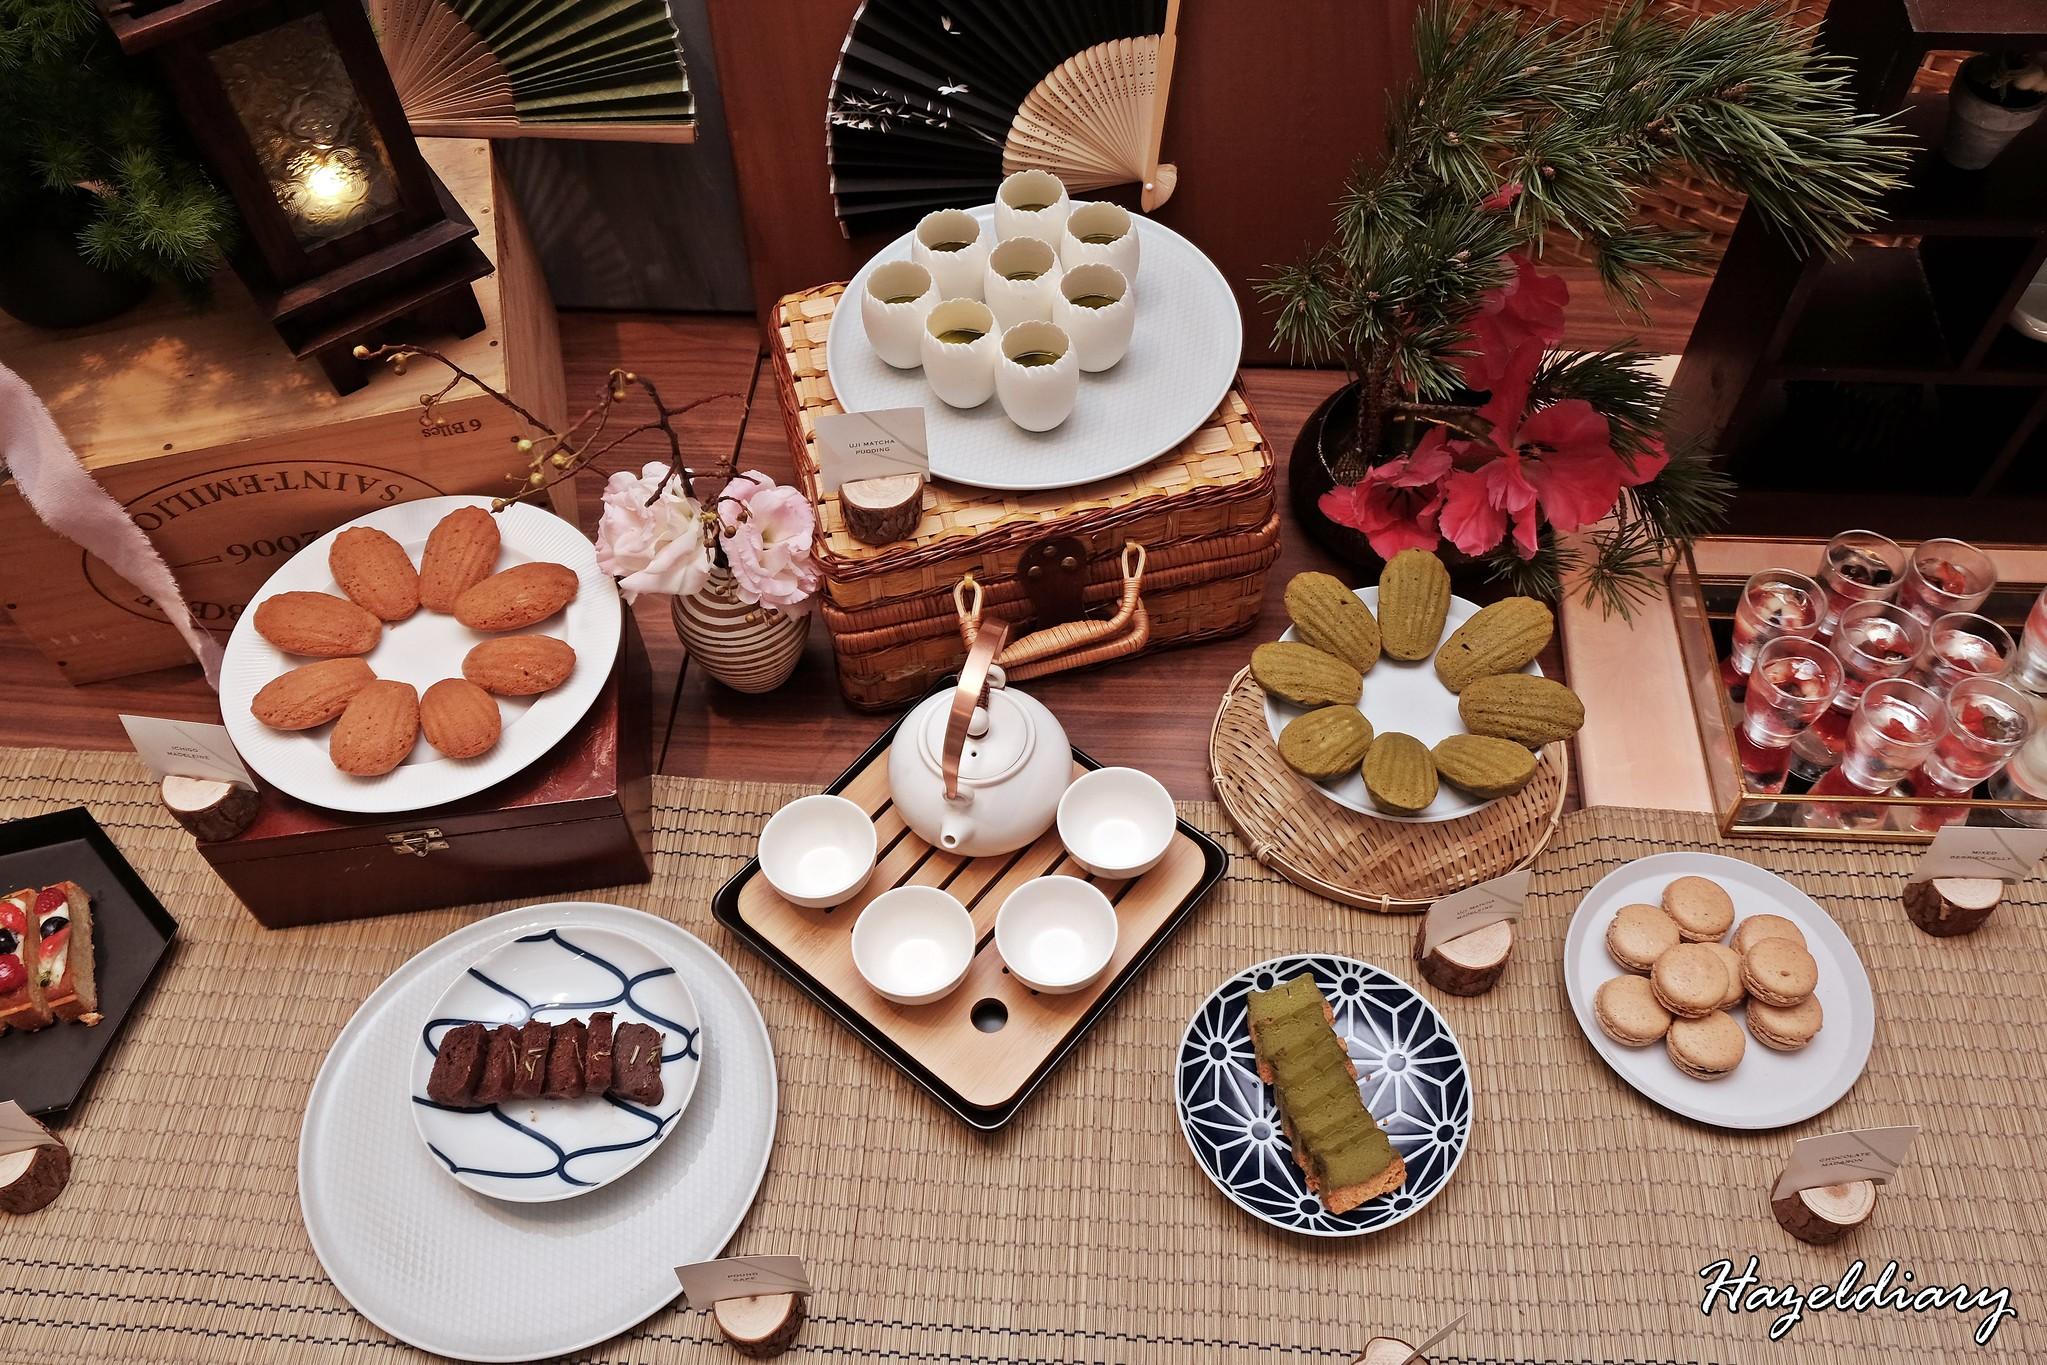 [SG EATS] 3-Course Lunch Menu + Oh! Matcha Season of Ichigo Afternoon Delight Dessert Buffet At Lewin Terrace